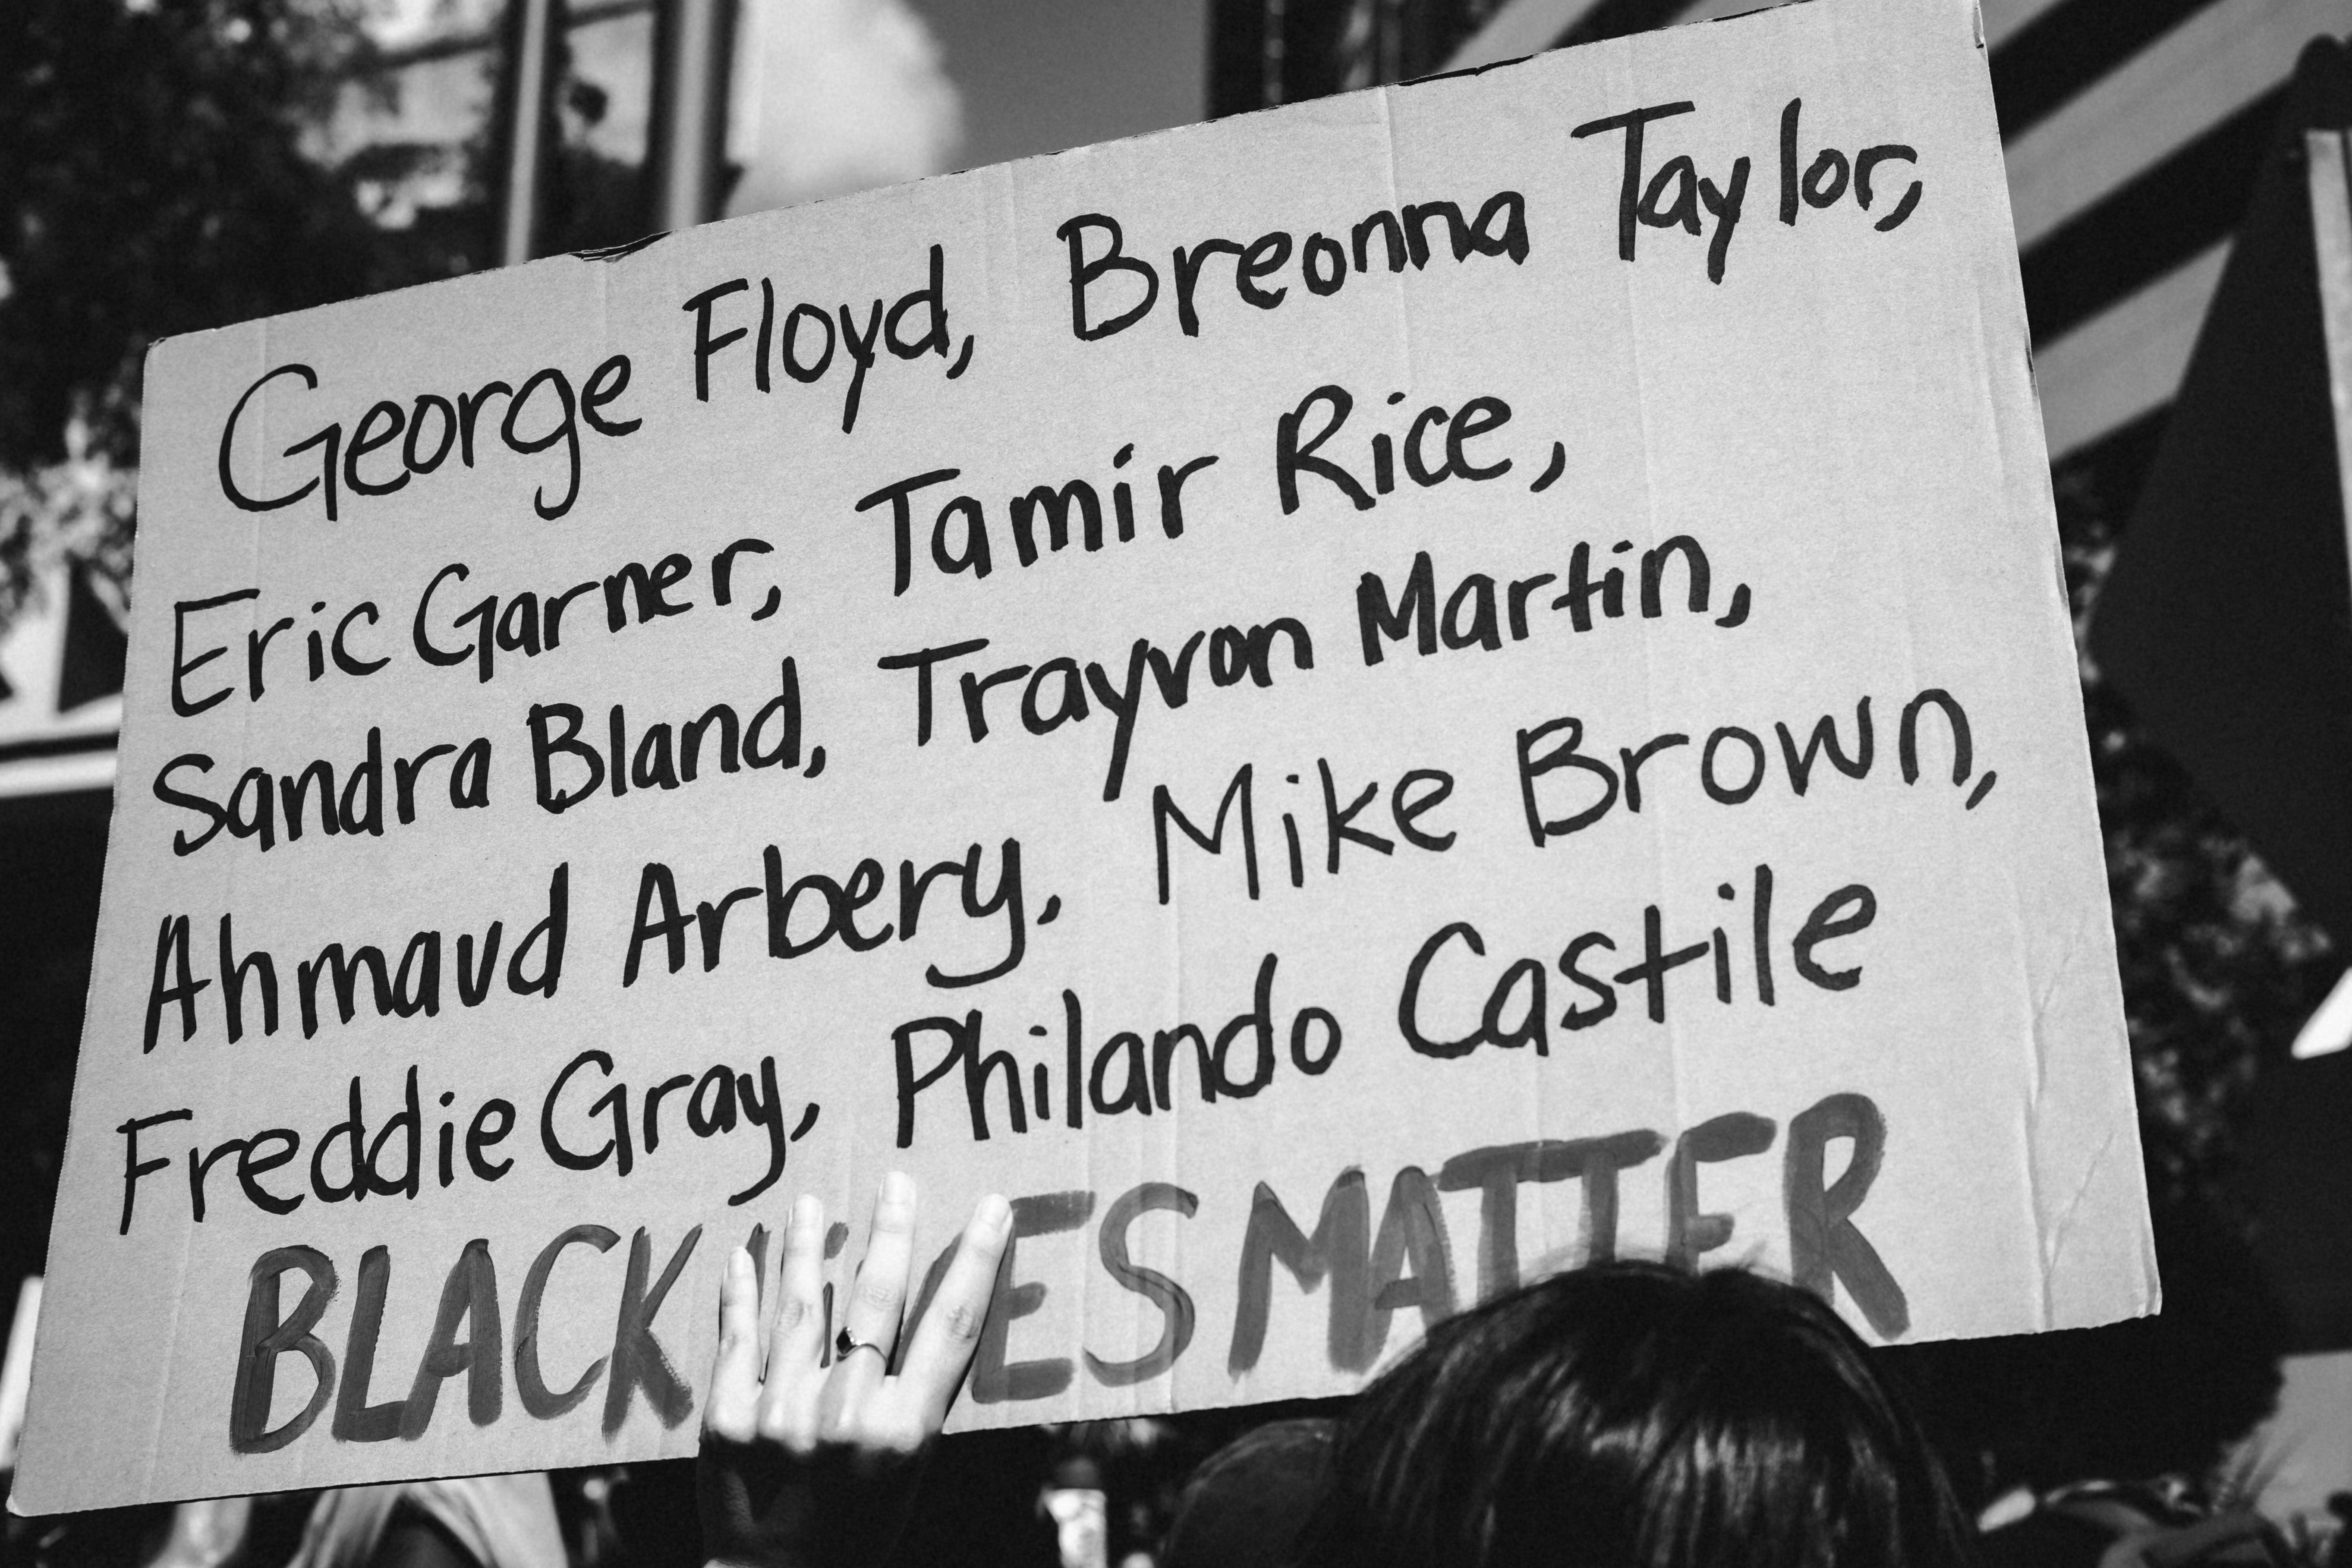 Black Lives Matter: 24 Biblical Considerations